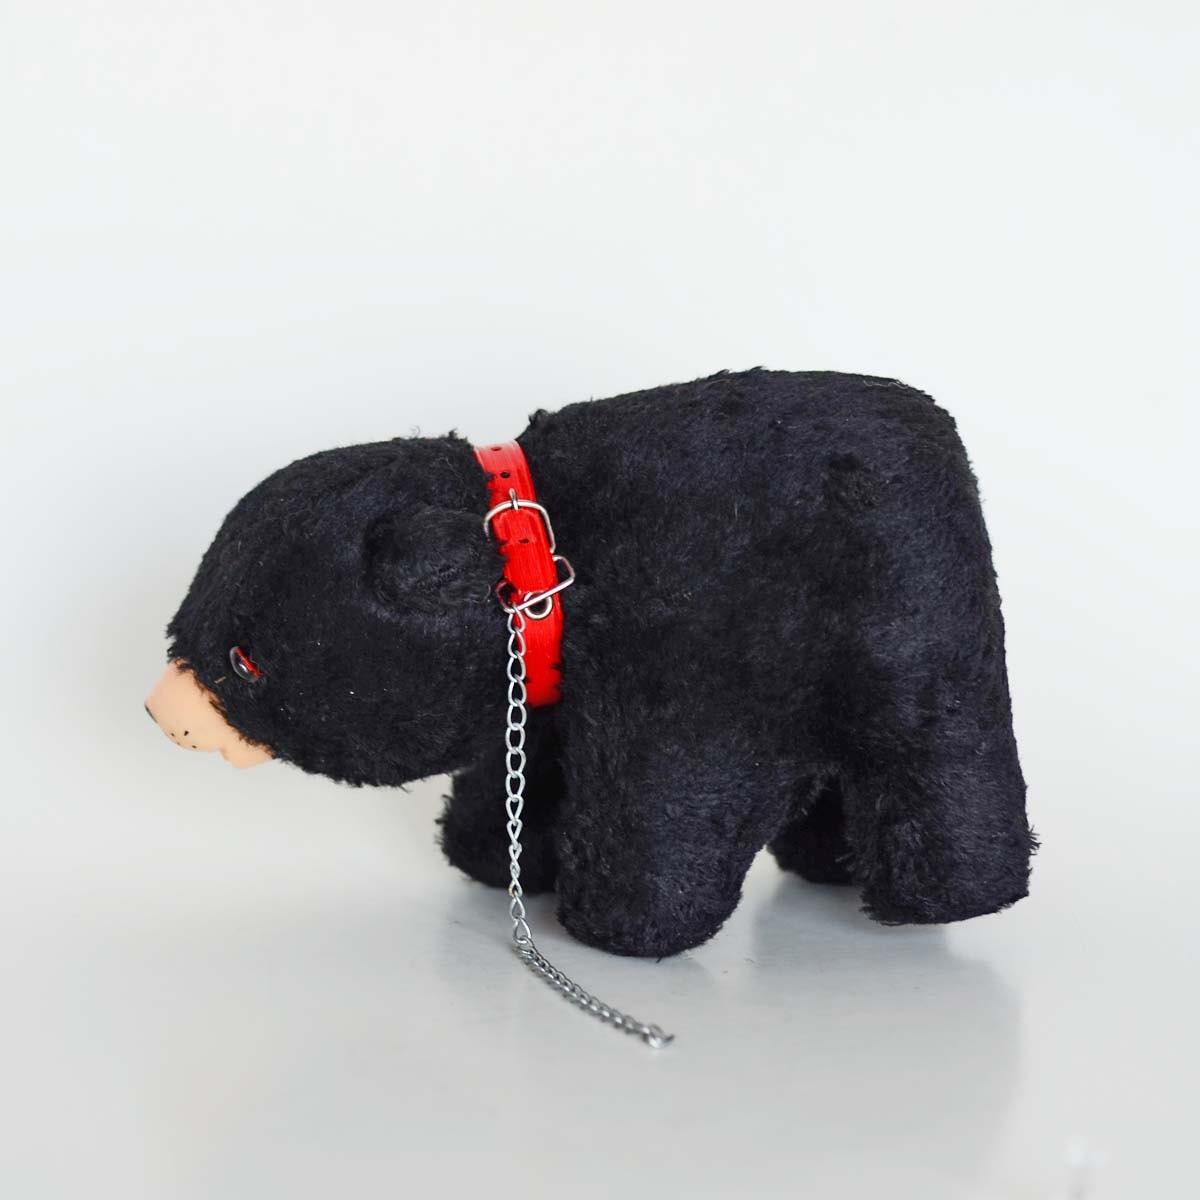 Vintage Yellowstone Park Bear Cub Souvenir Stuffed Animal